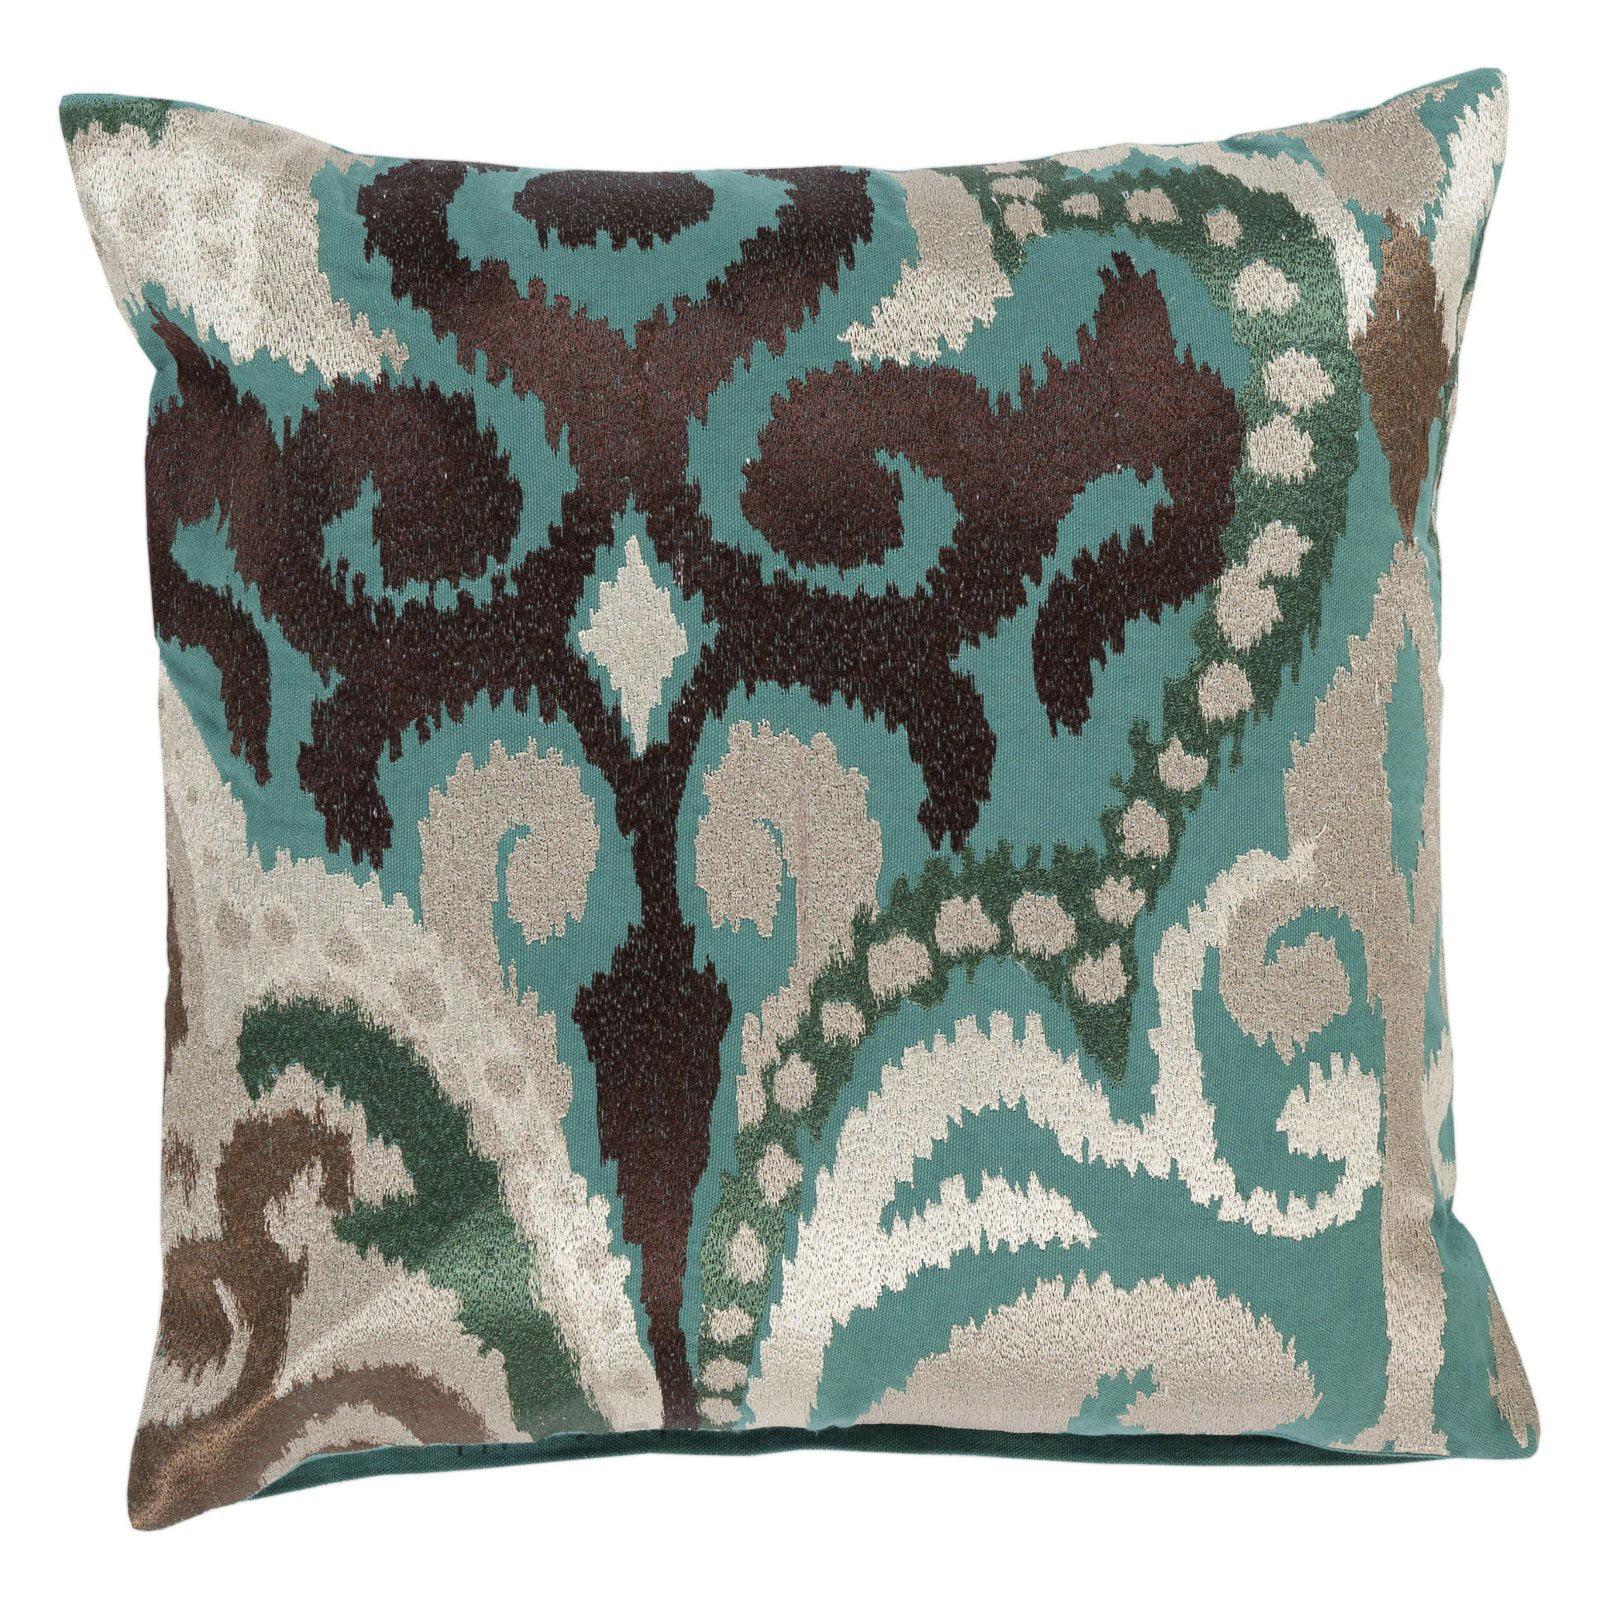 Surya Radiant Swirl Decorative Throw Pillow